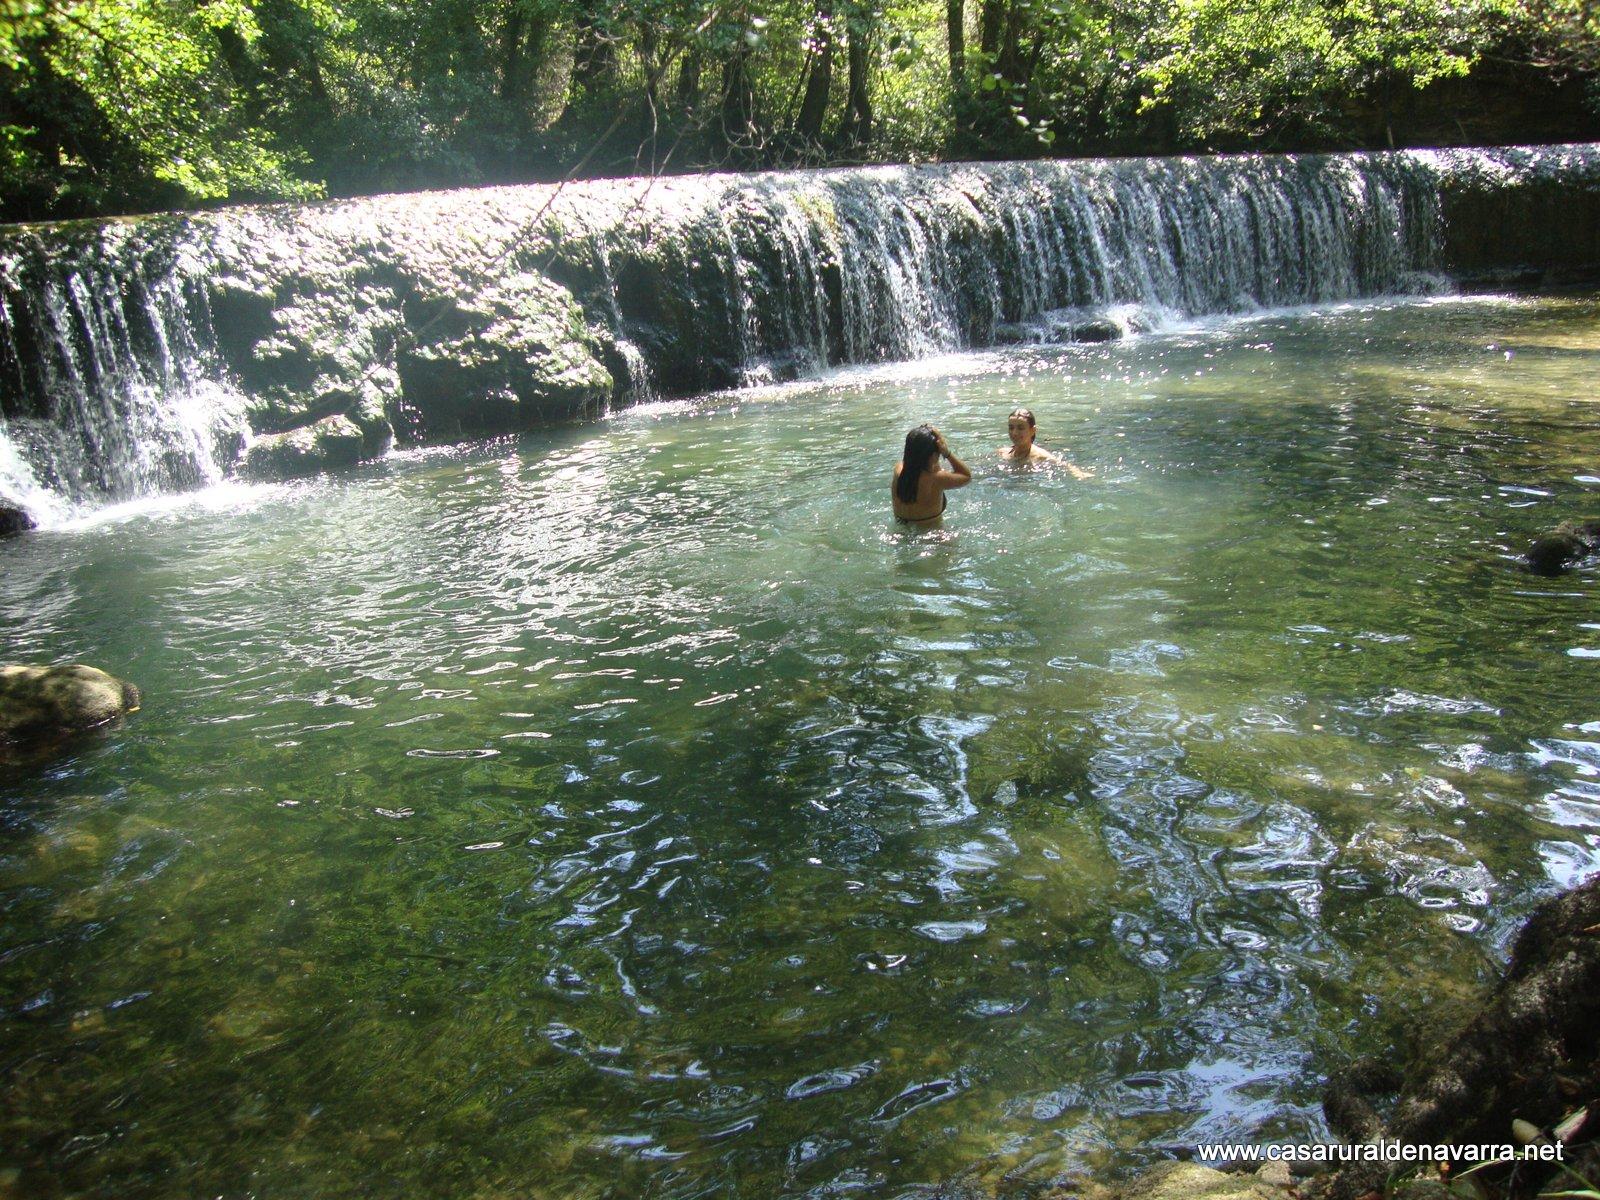 Turismo rural en navarra pierdete en casa rural for Piscinas naturales urederra